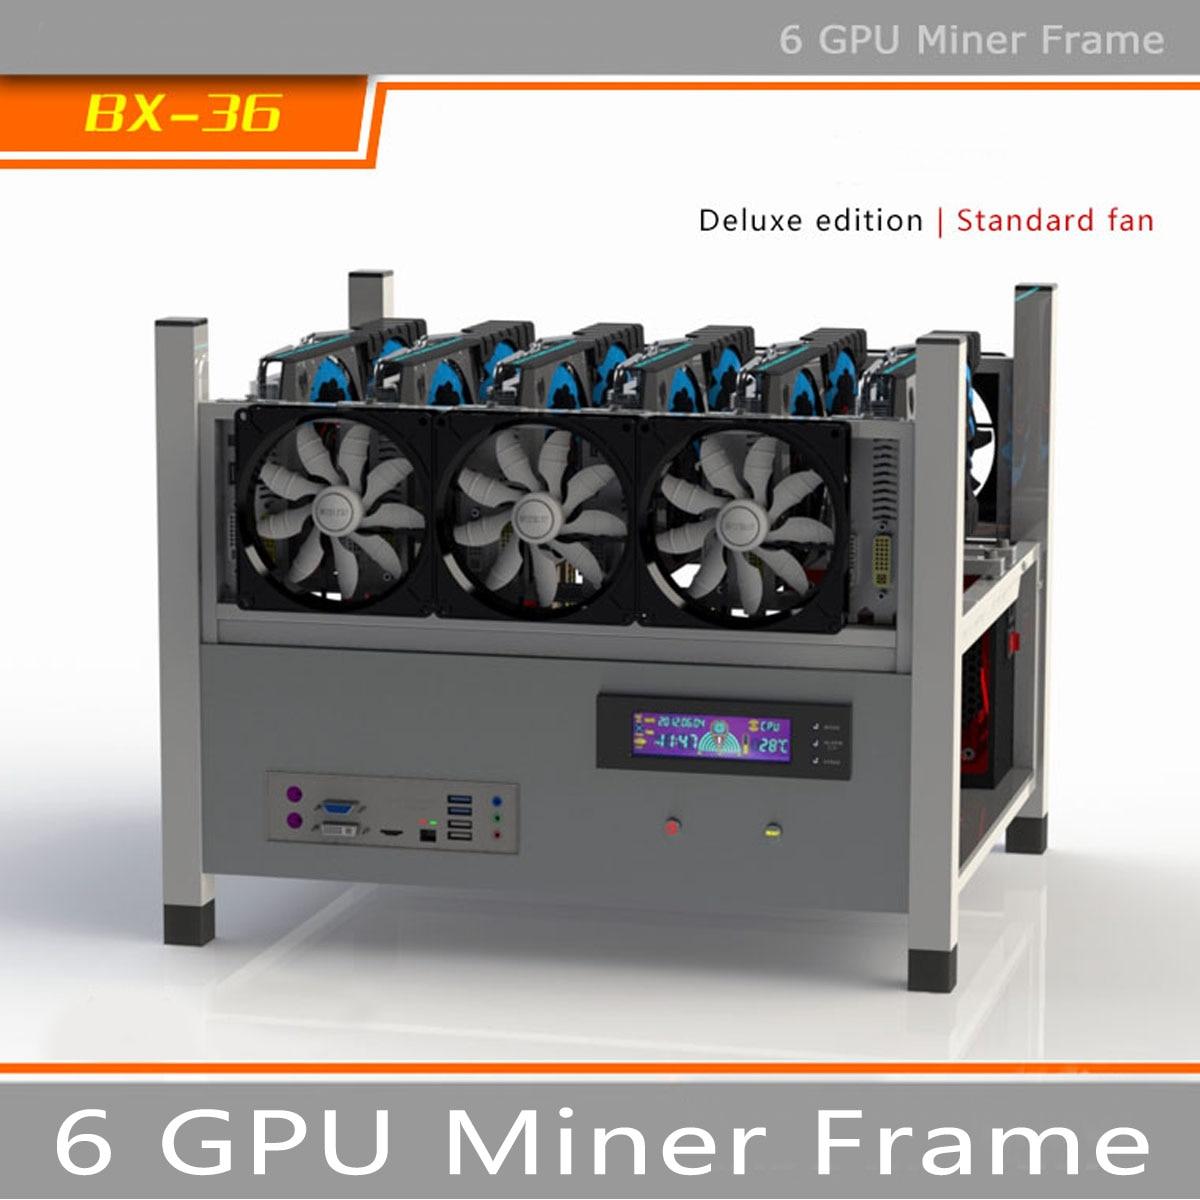 BX36 6GPU Open Air Ферма для майнинга рамки Шахтер случае ящик стиль Crypto монета для 6 вентиляторы компьютер добыча случае сервер шасси